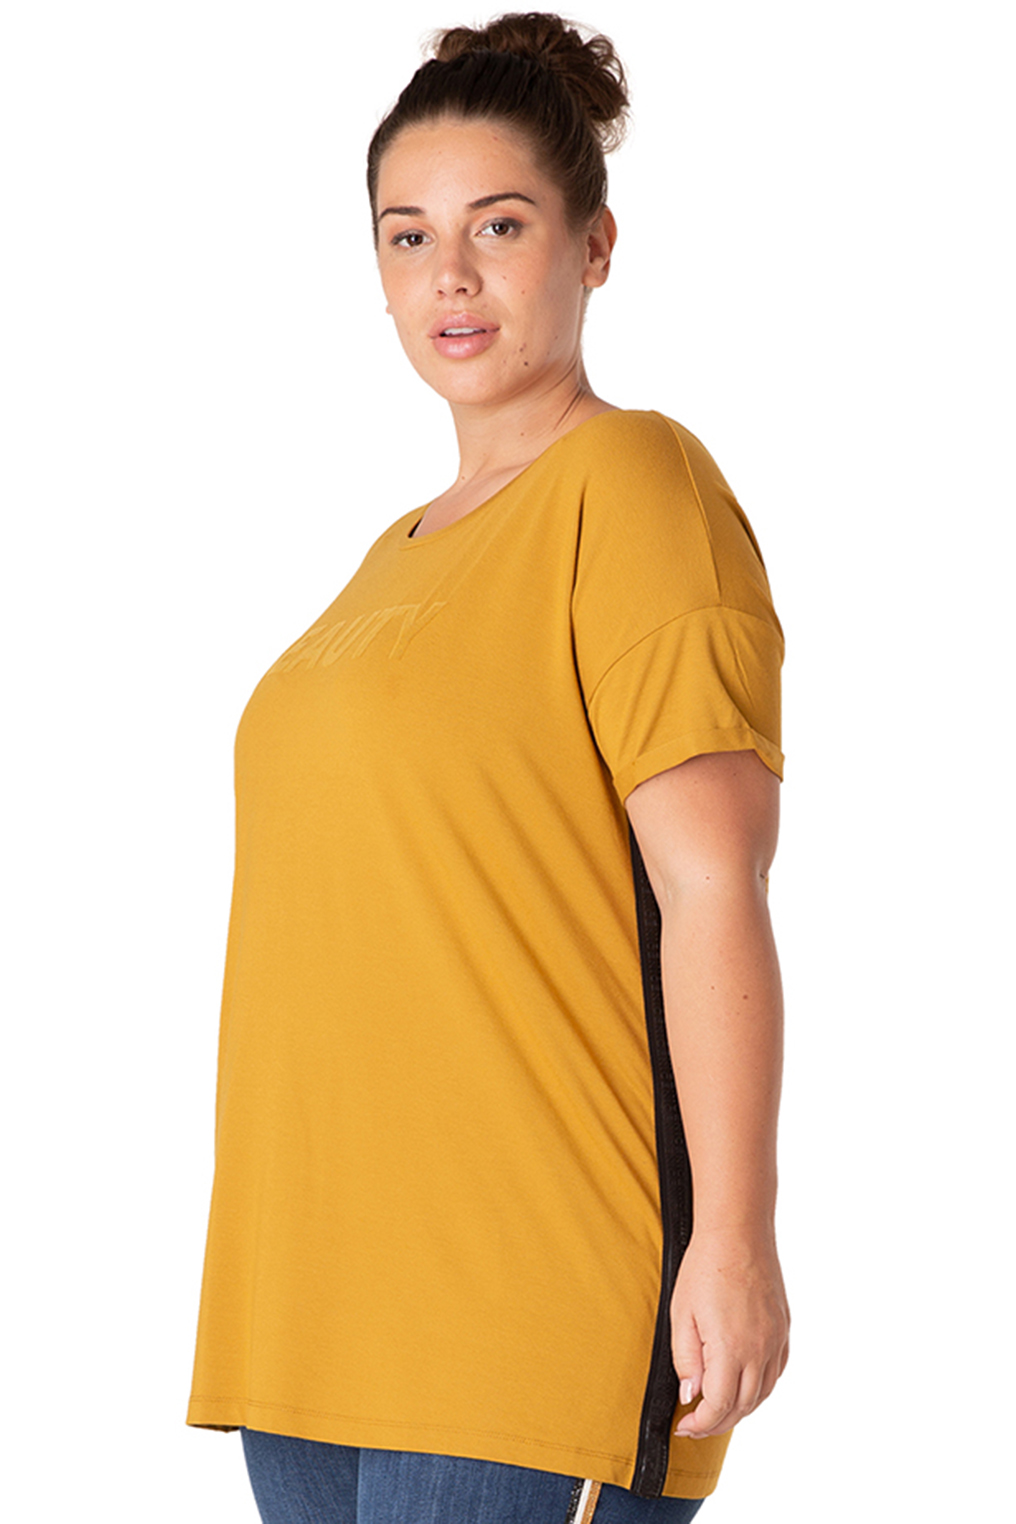 Shirt Yesta tekst en bies 76CM